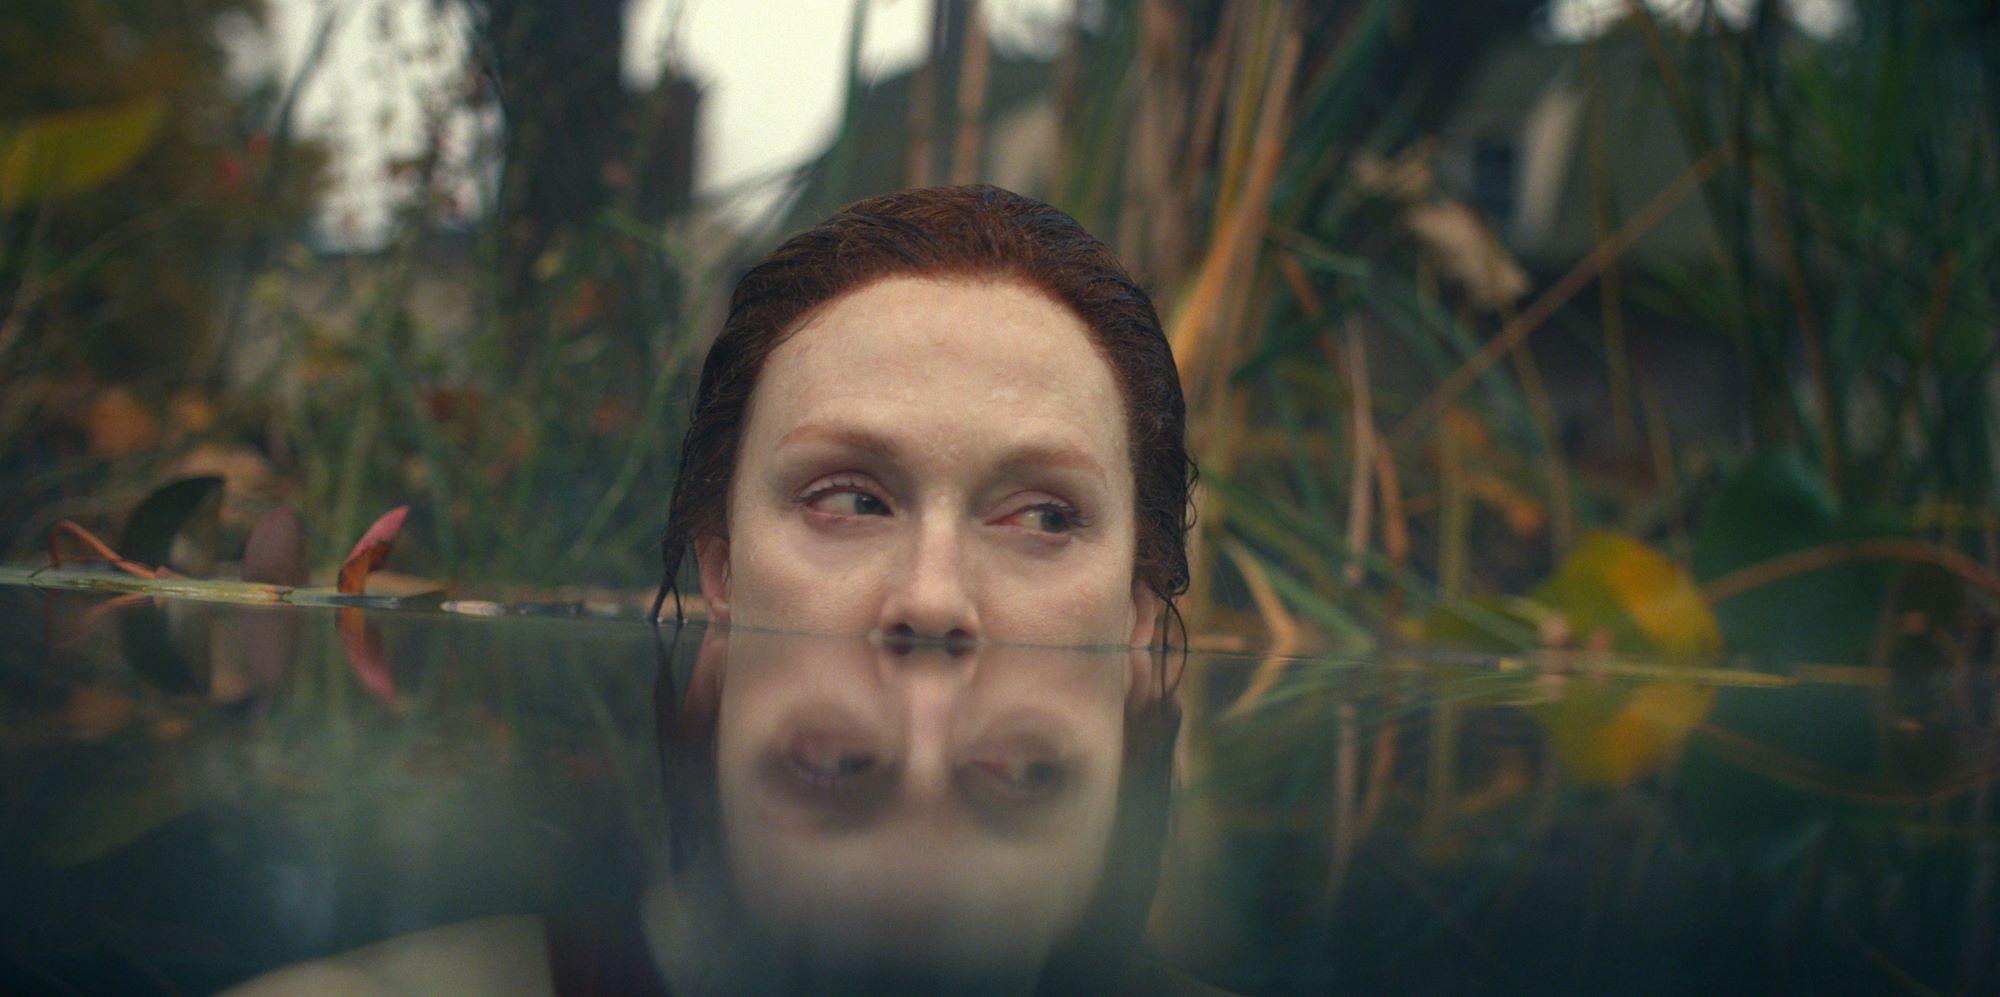 Julianne Moore in the Apple TV series 'Lisey's Story'